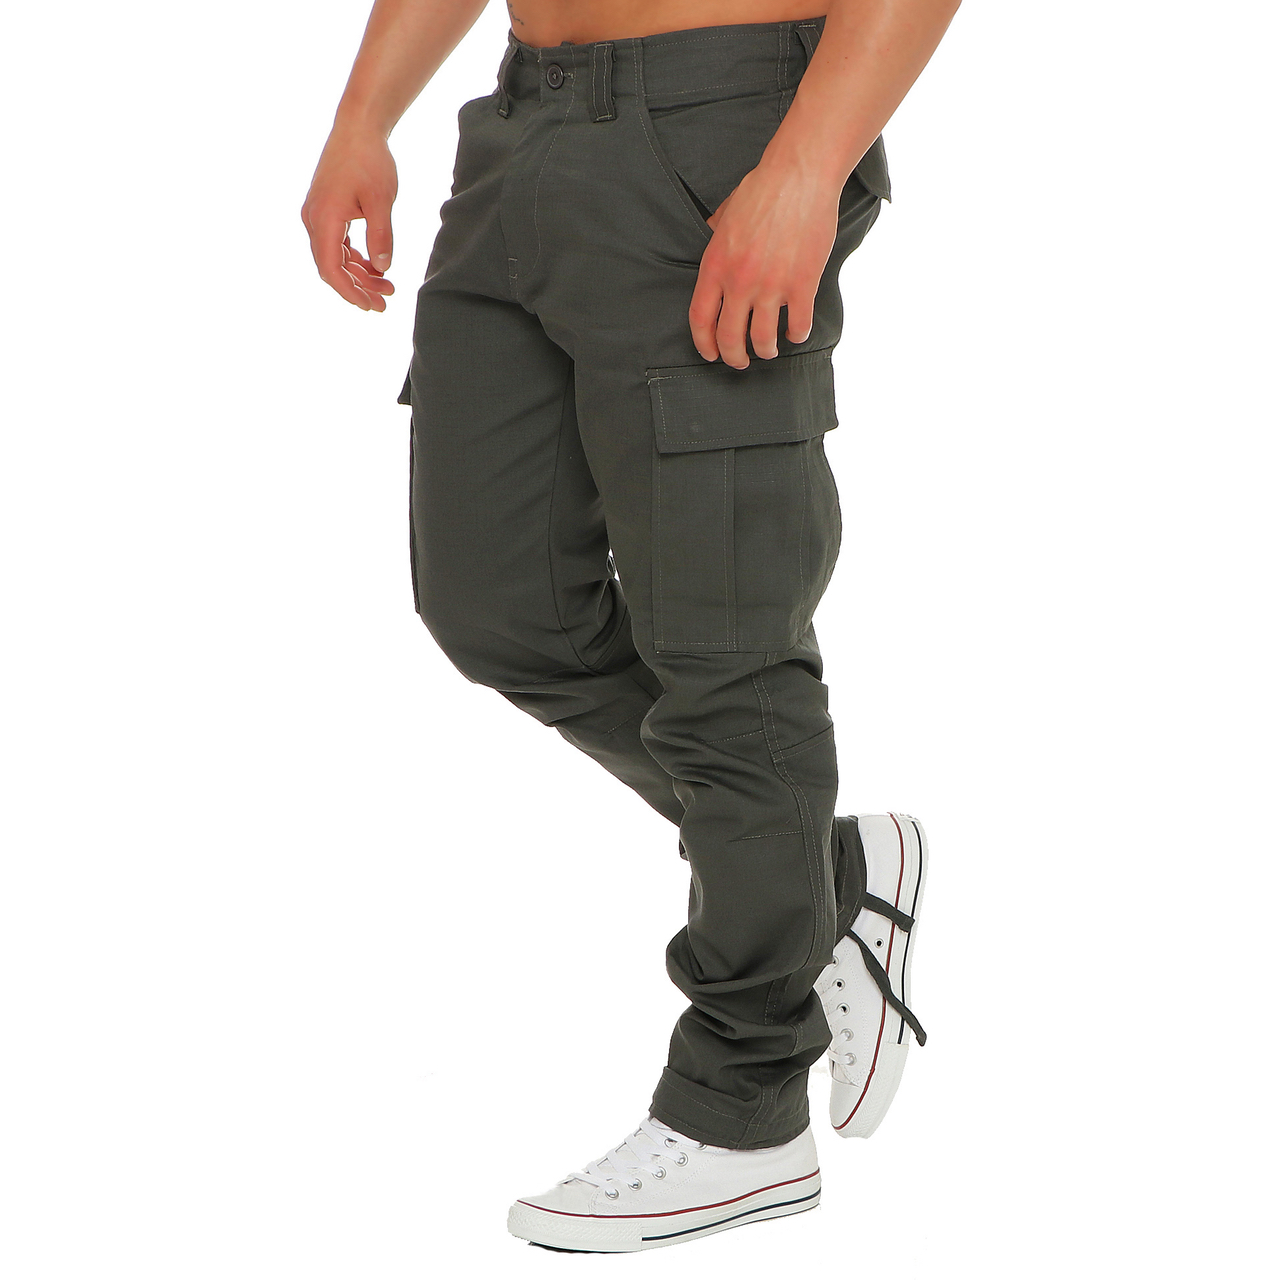 finchman-Hombre-Cargo-f1001-Pantalon-Pantalones-Calzoncillos-Informales-Ajuste